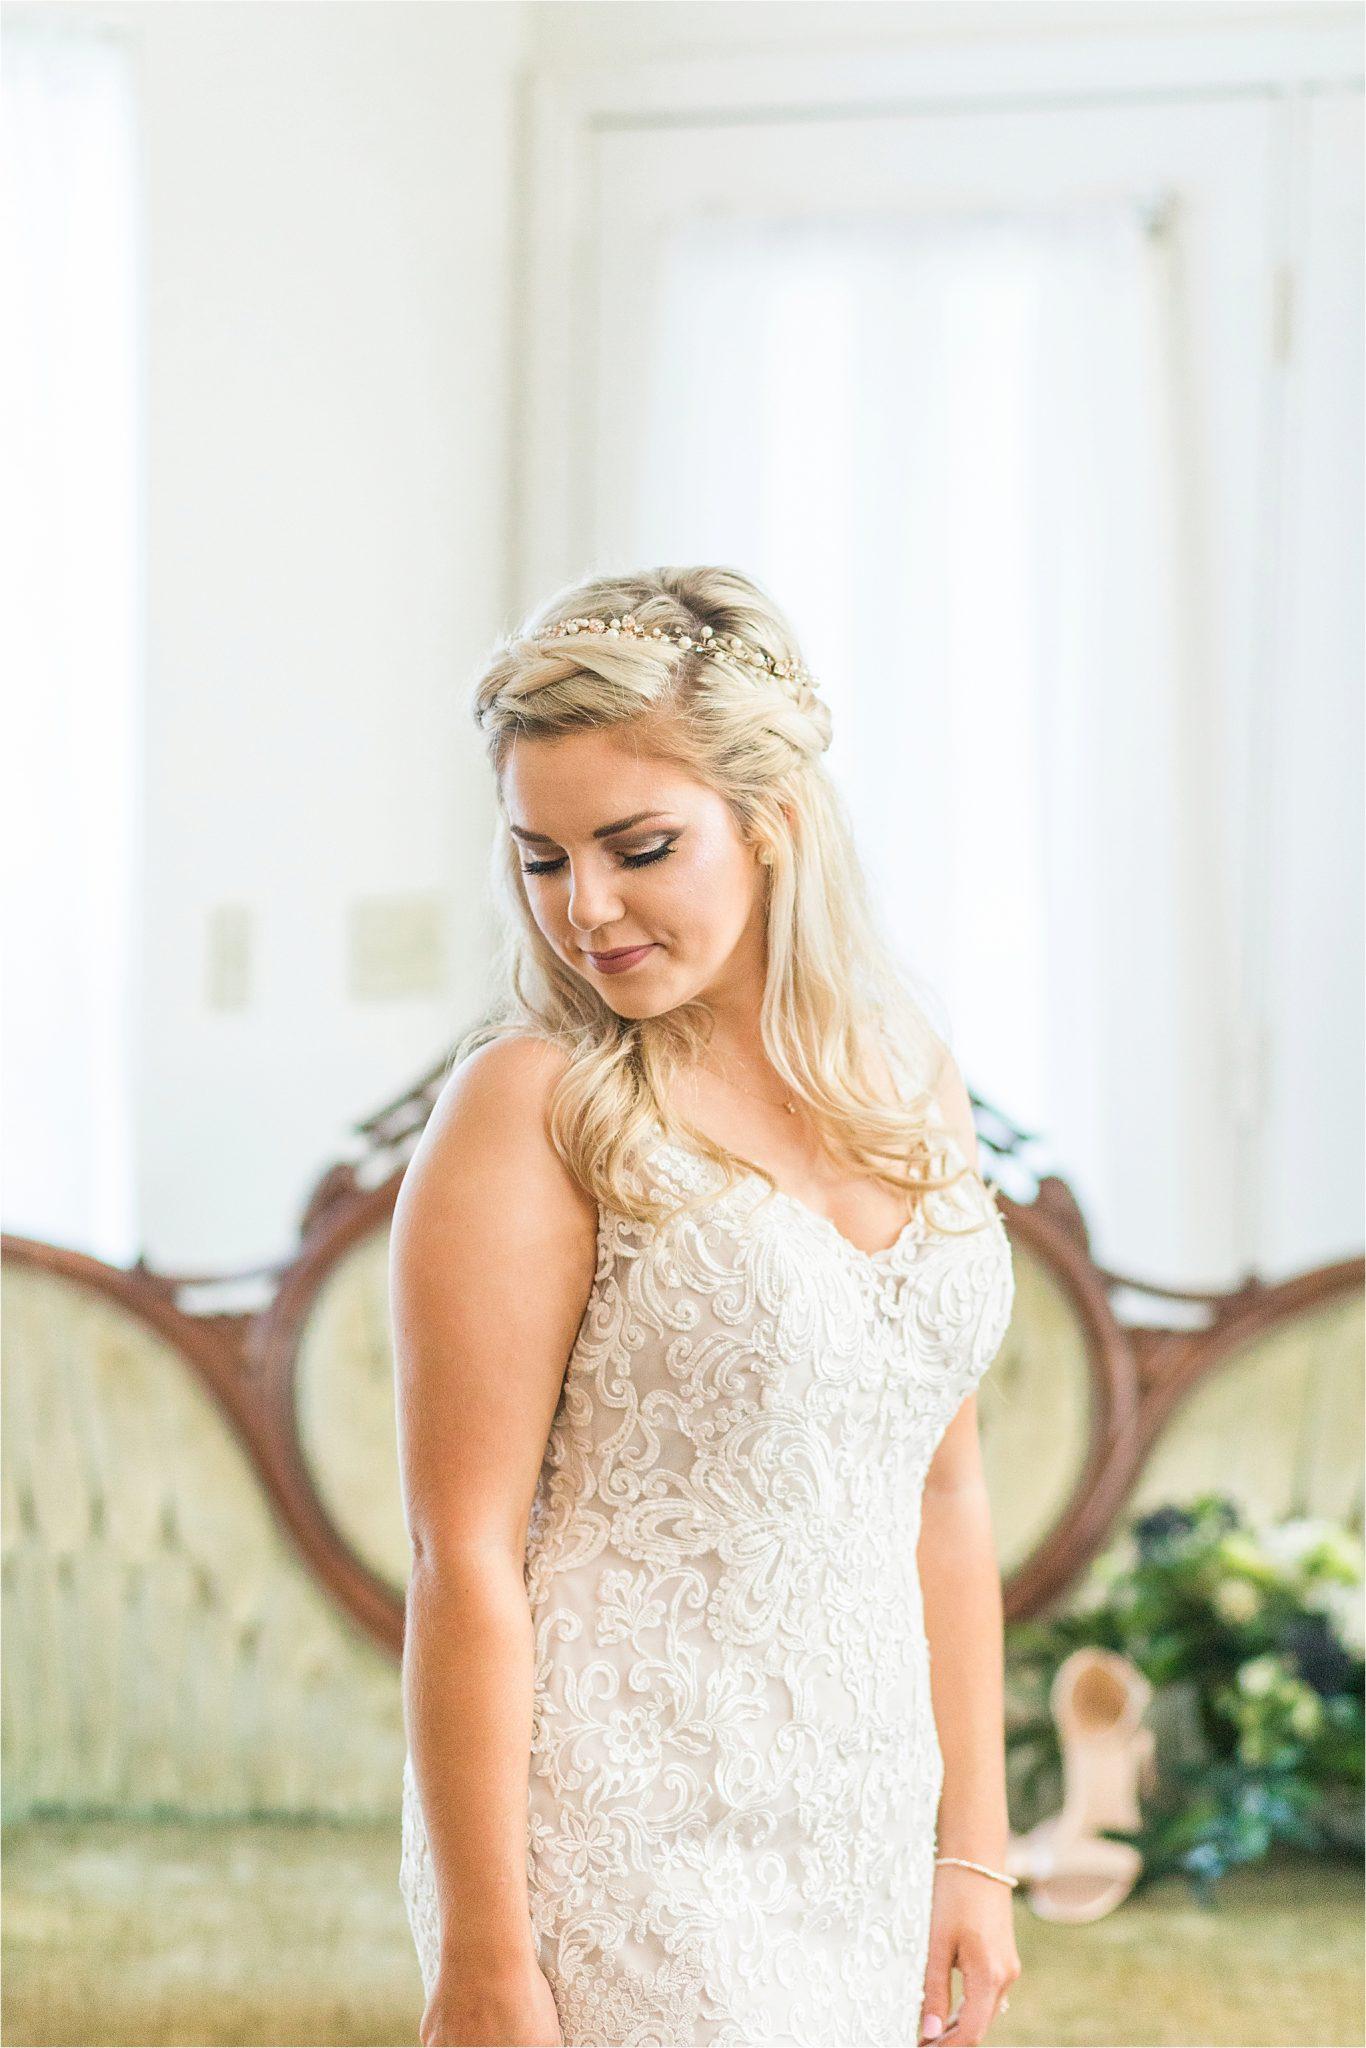 lace-detail-wedding-dress-pearl-flower-crown-bridal-portraits-bride